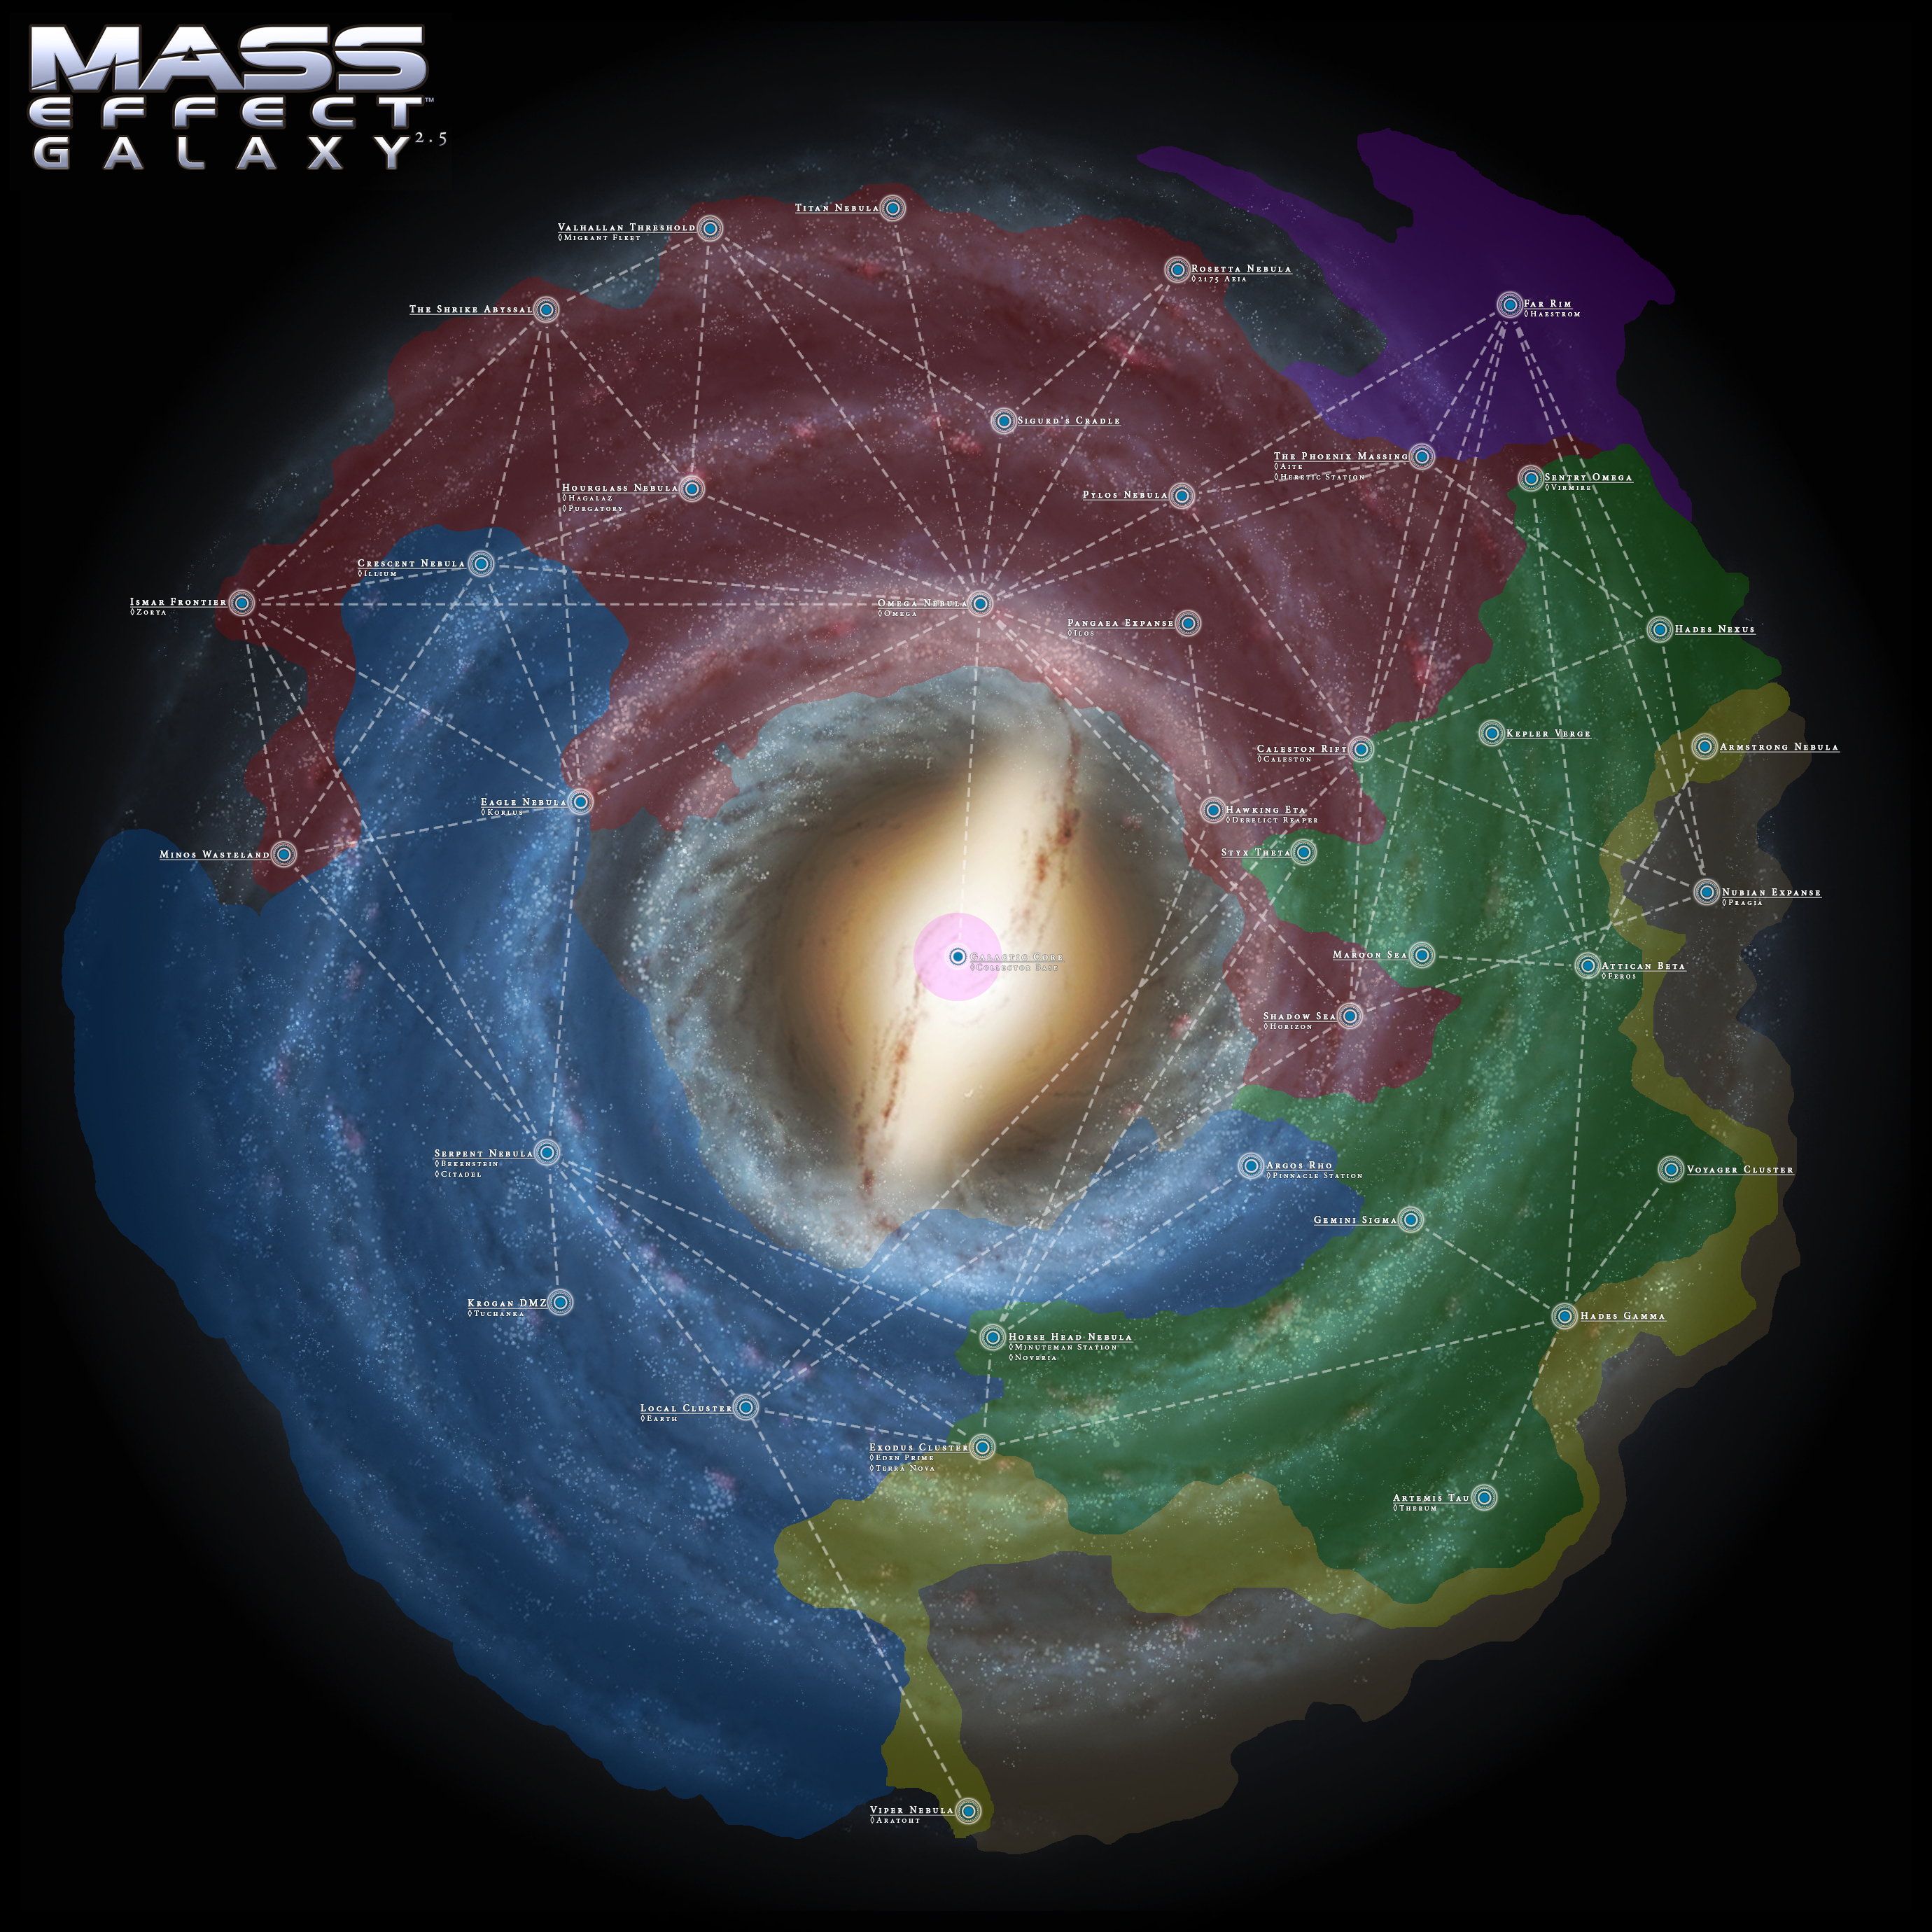 mass_effect_galaxy_map_2_5_by_dwebart-d3f80ft.png